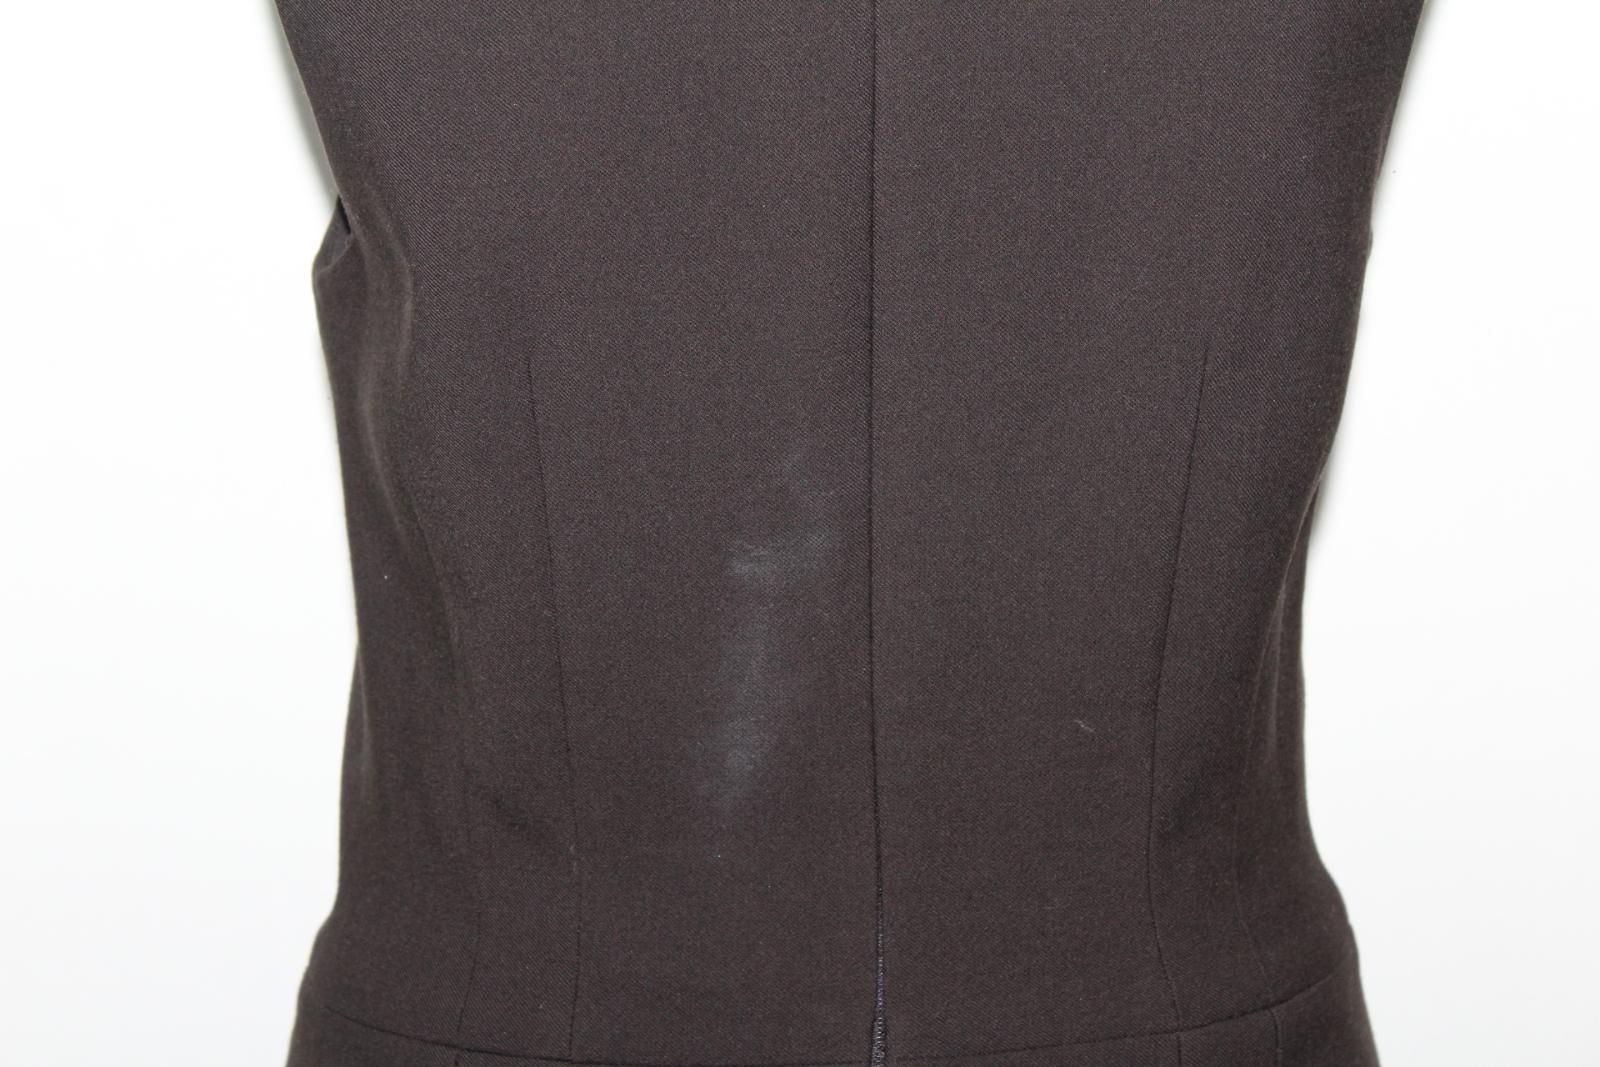 Saba-Senoras-sin-mangas-Marron-Oscuro-Cuello-Redondo-Vestido-Lapiz-Wiggle-UK8-EU36 miniatura 6